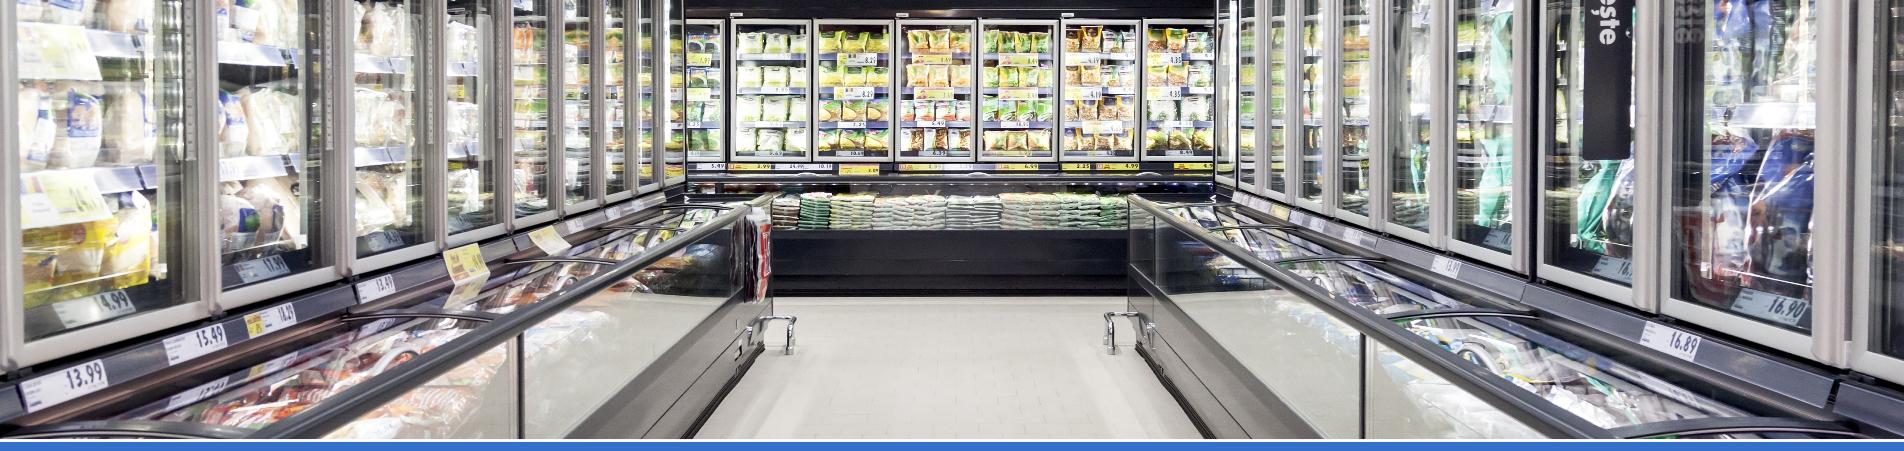 Emme Gel distribuzione surgelati - retail